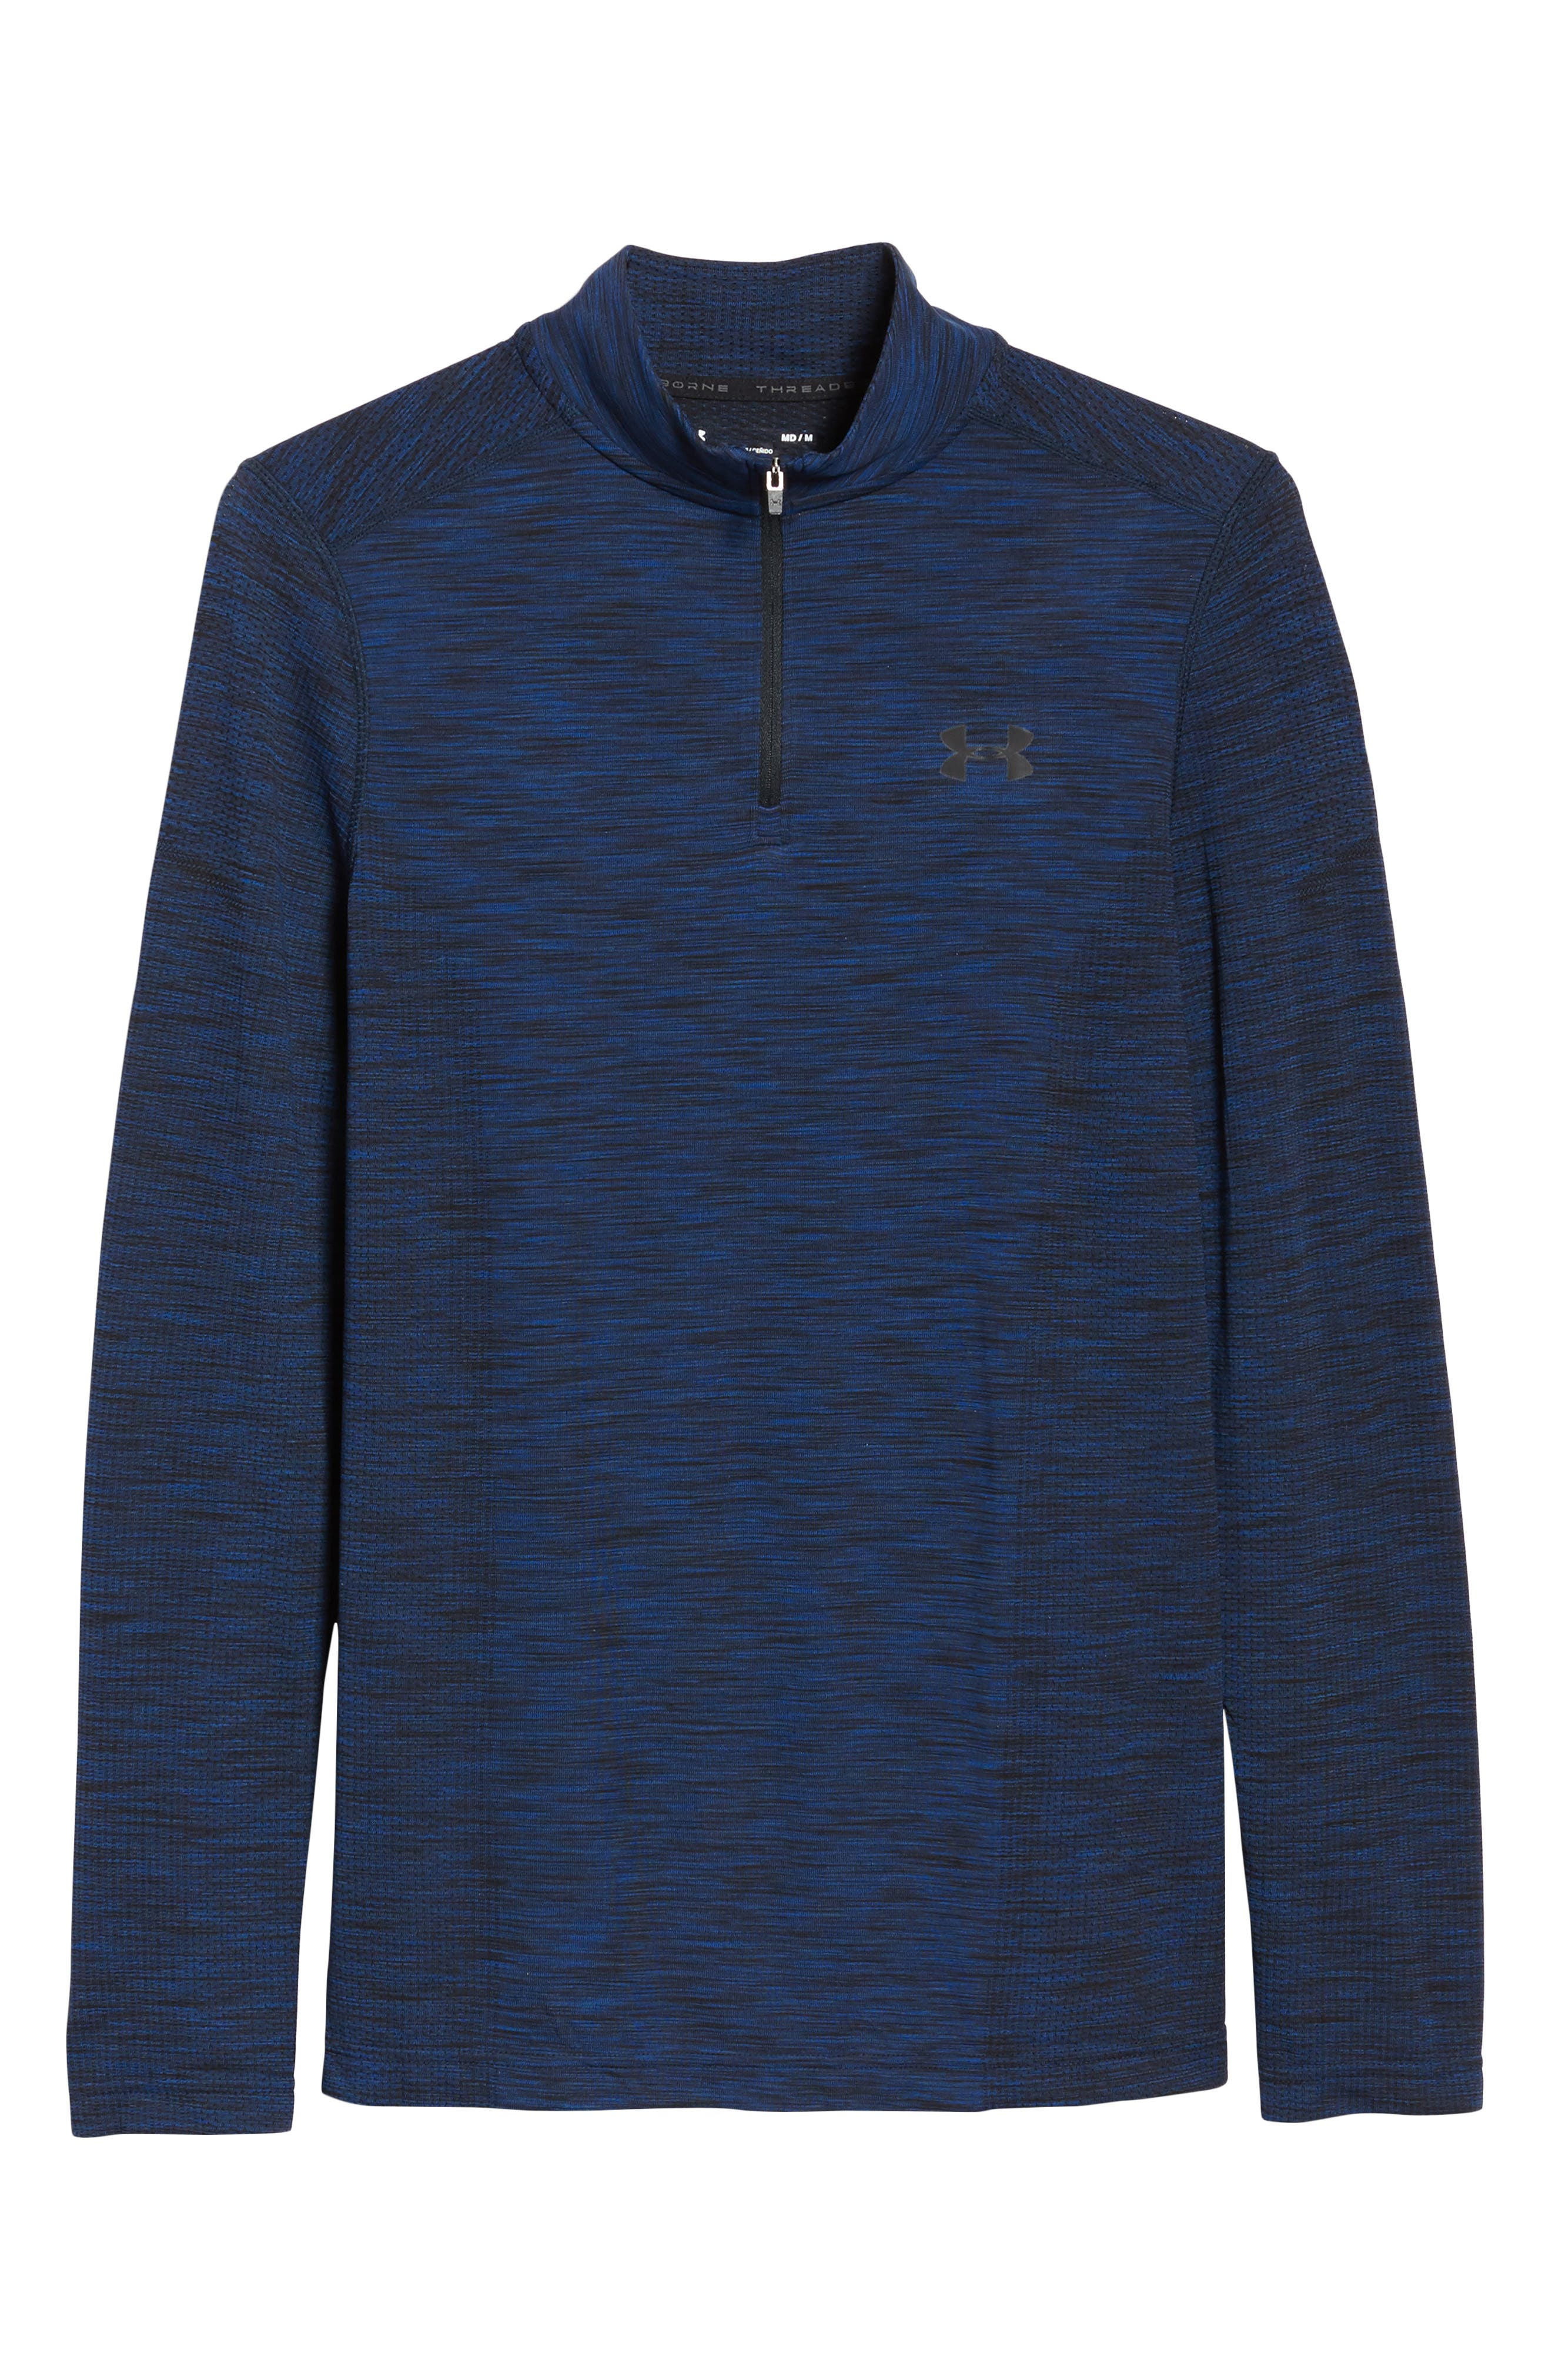 Threadborne Seamless Quarter Zip Pullover,                             Alternate thumbnail 6, color,                             Blue